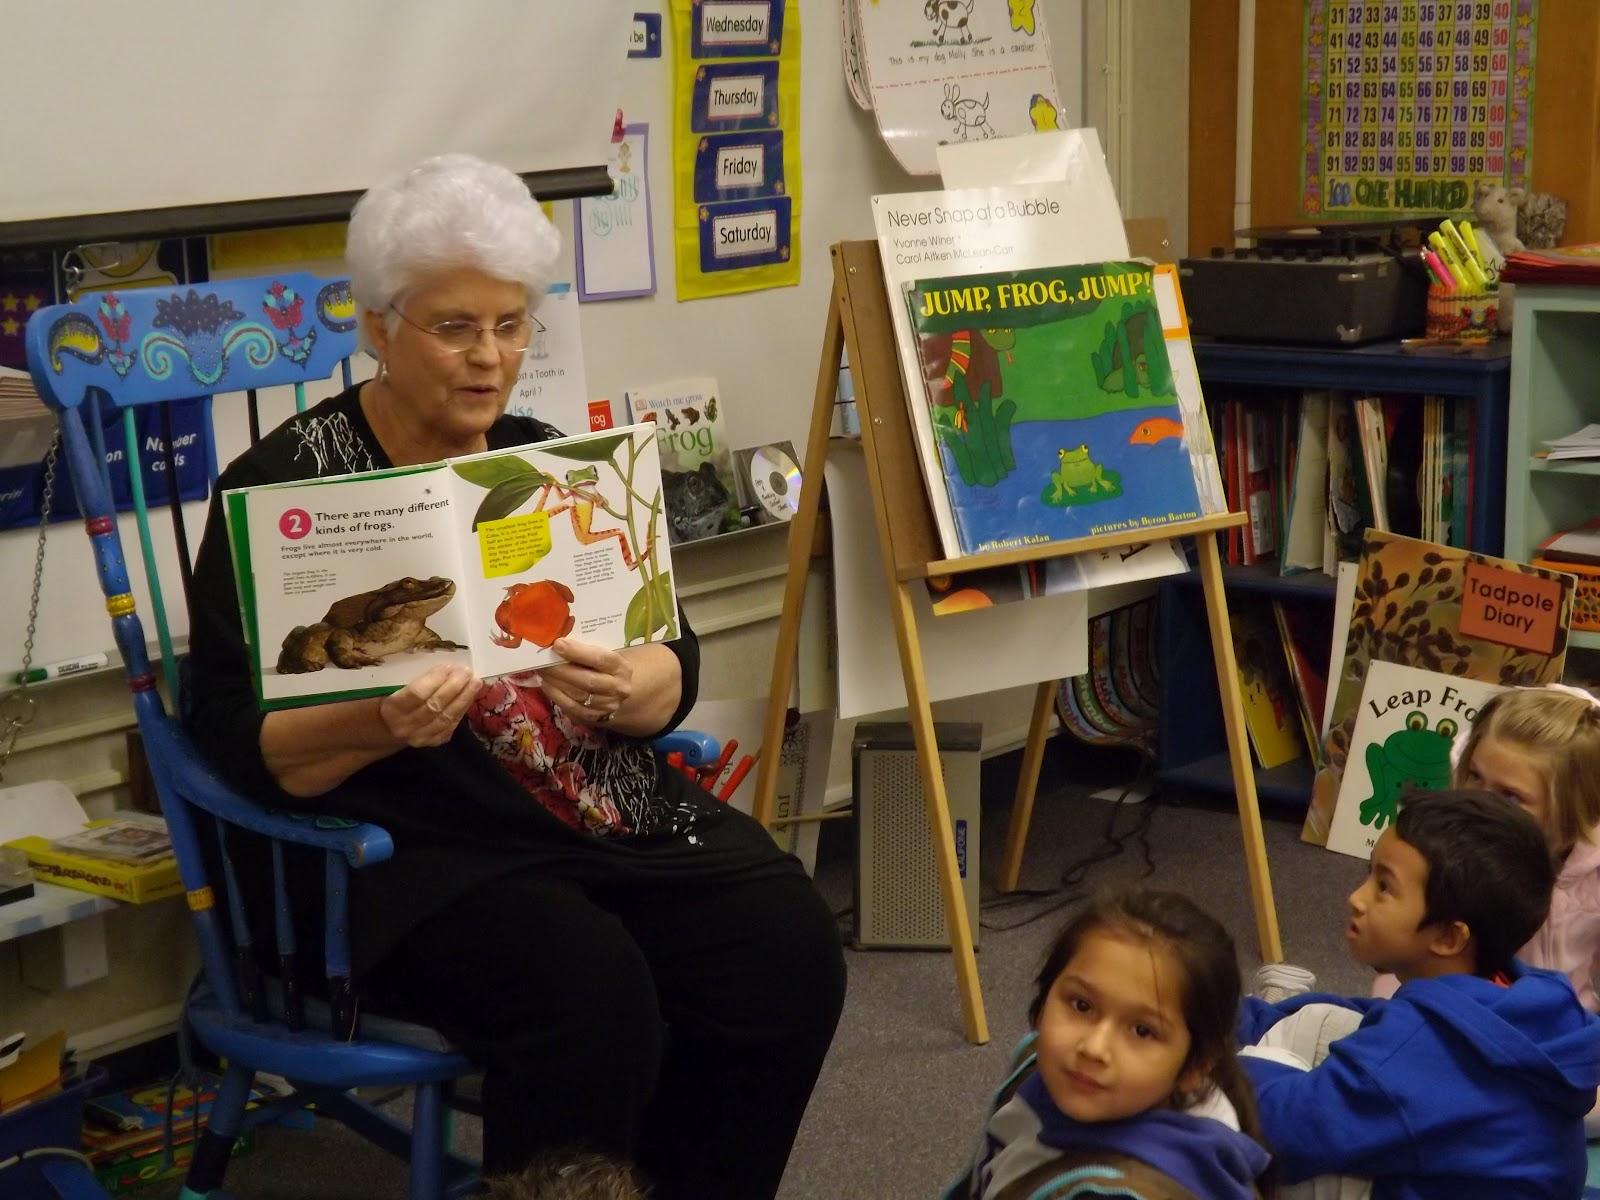 Venn Diagram Of Reptiles And Amphibians Drayton Lifestyle Mid Position Valve Wiring Mrs Vento 39s Kindergarten